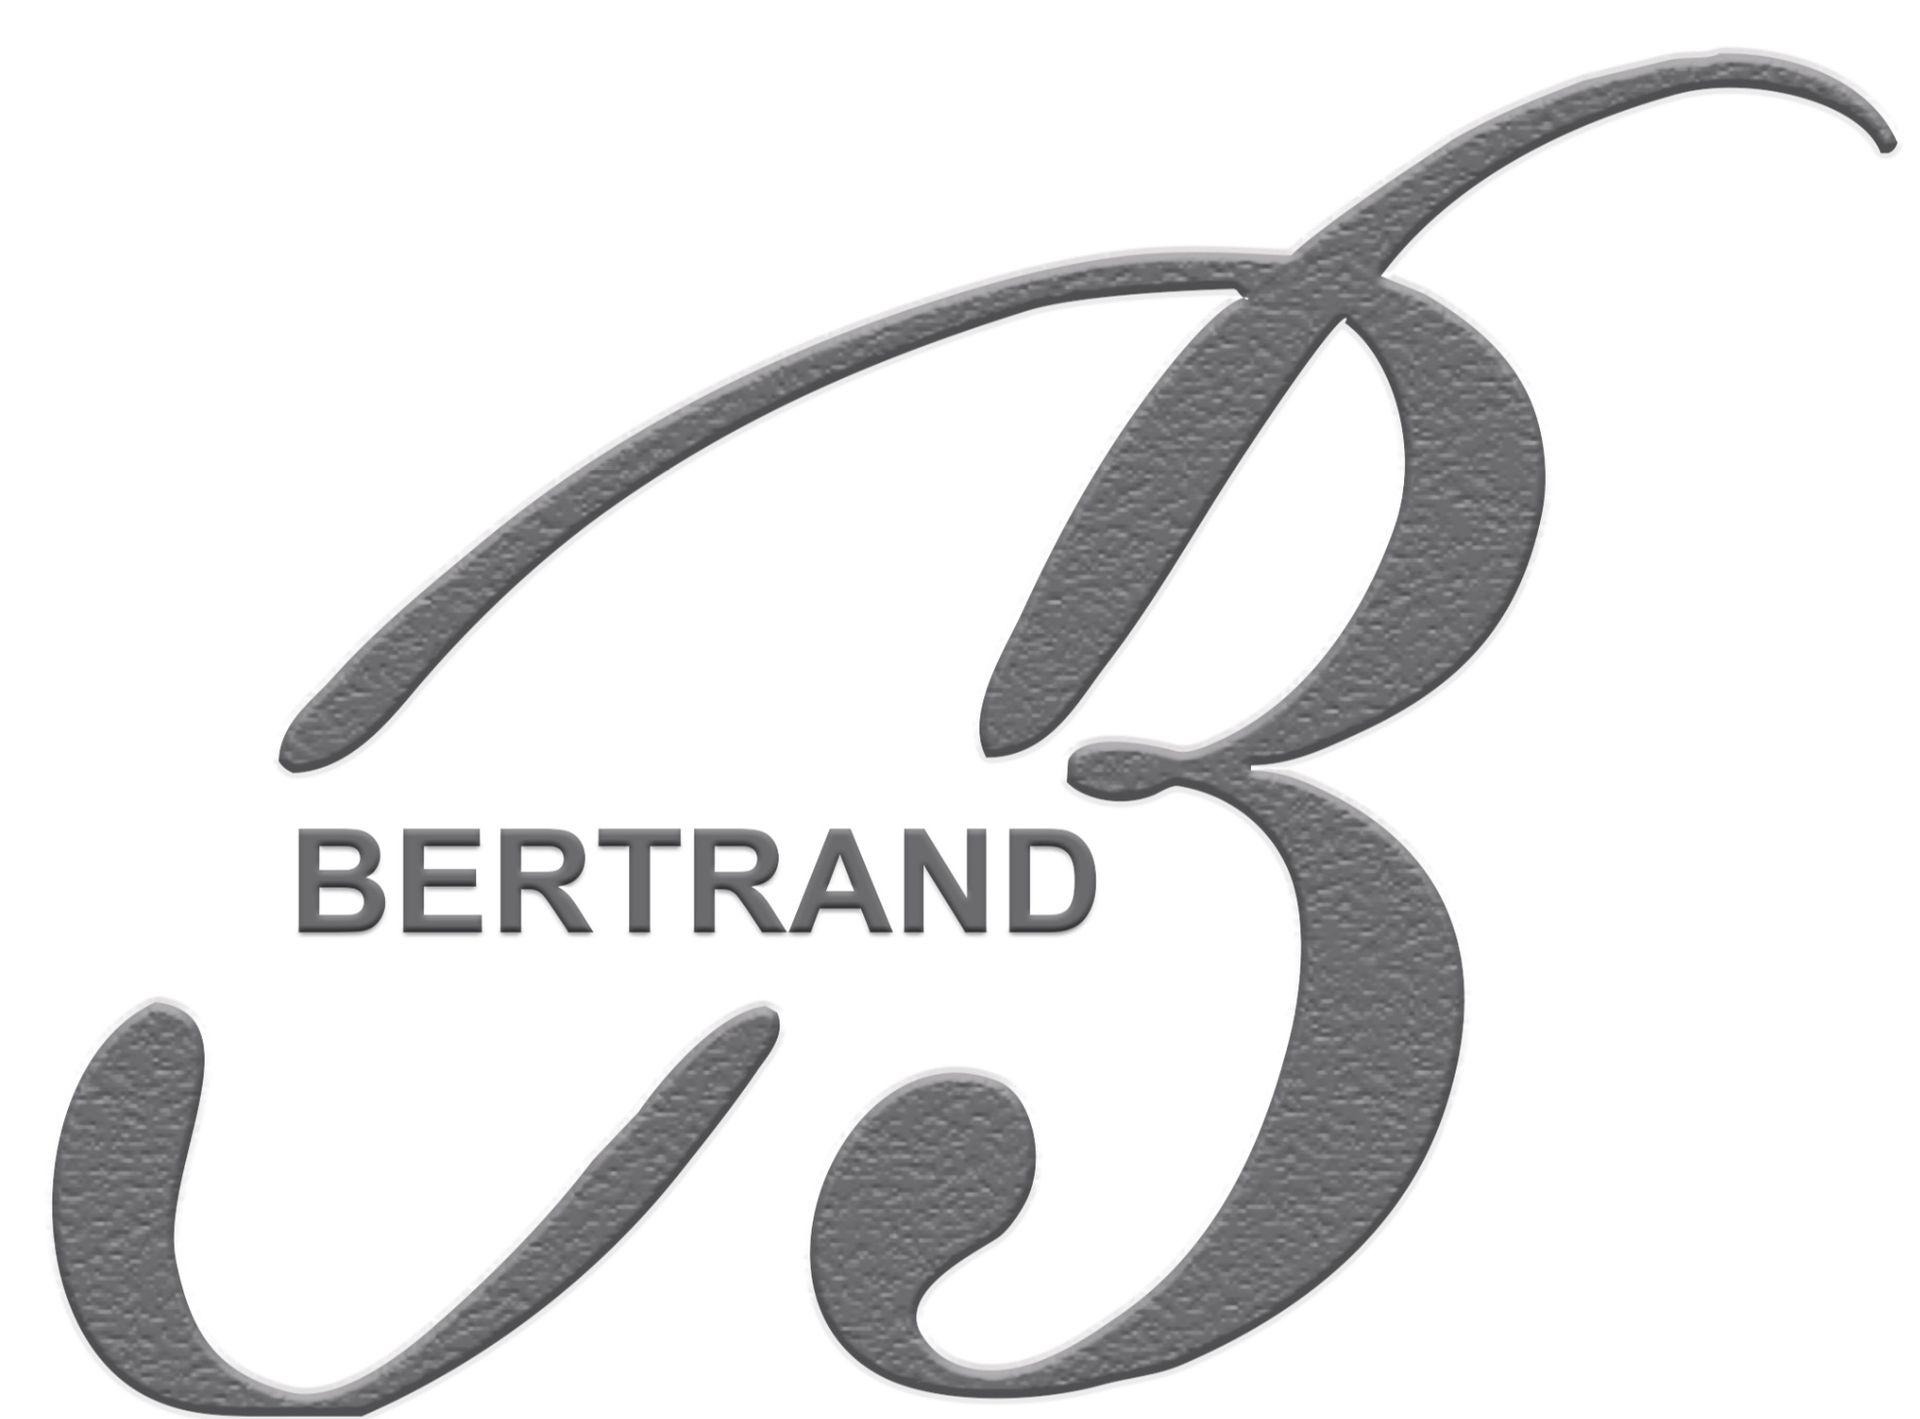 Bertrand SARL pompes funèbres, inhumation et crémation (fournitures)